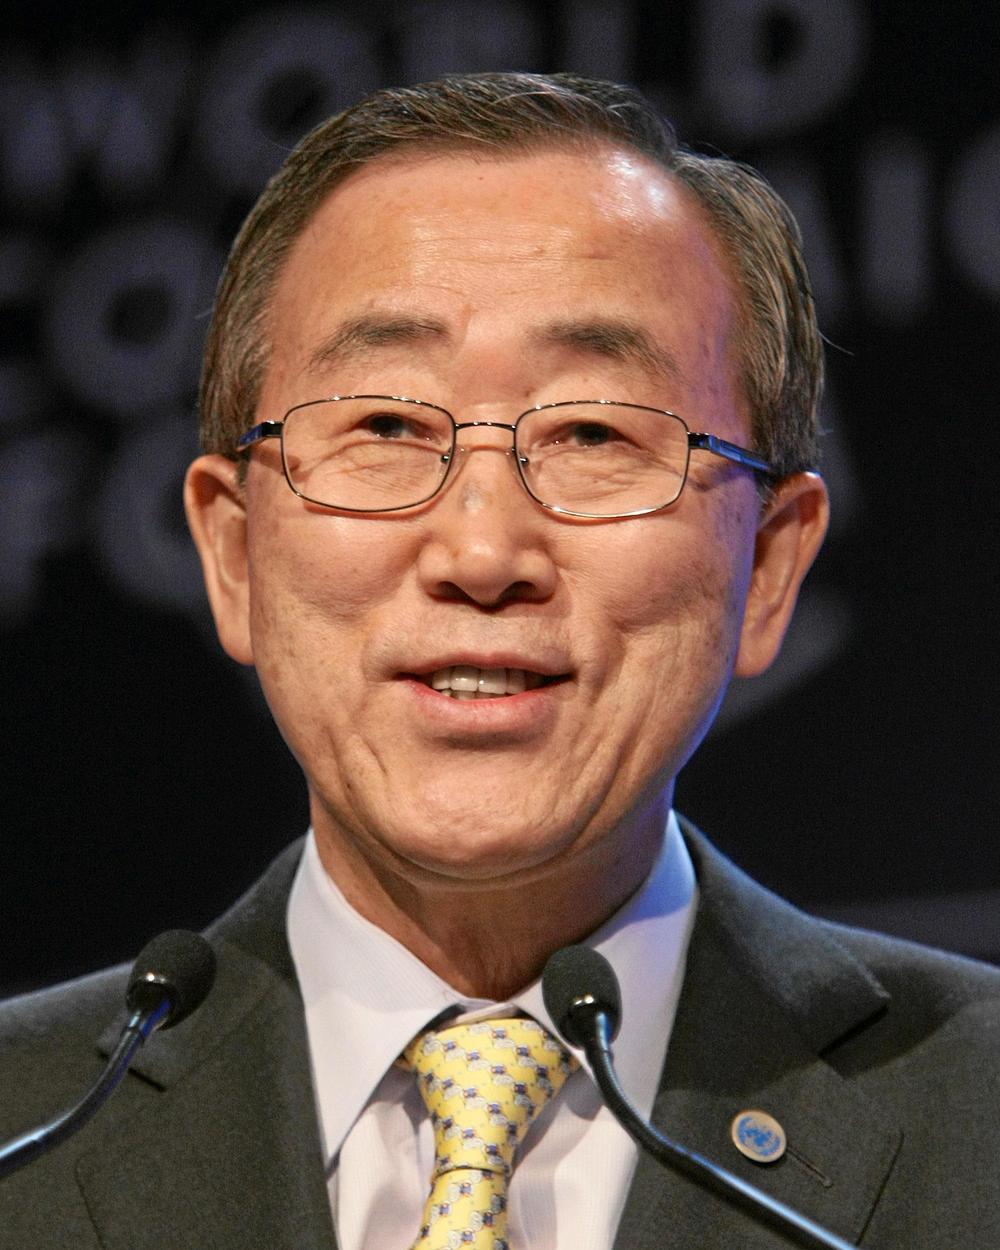 U.N. Secretary-General Ban Ki-moon backtracked on his claim that Israel suffers from U.N. bias. Credit: World Economic Forum.